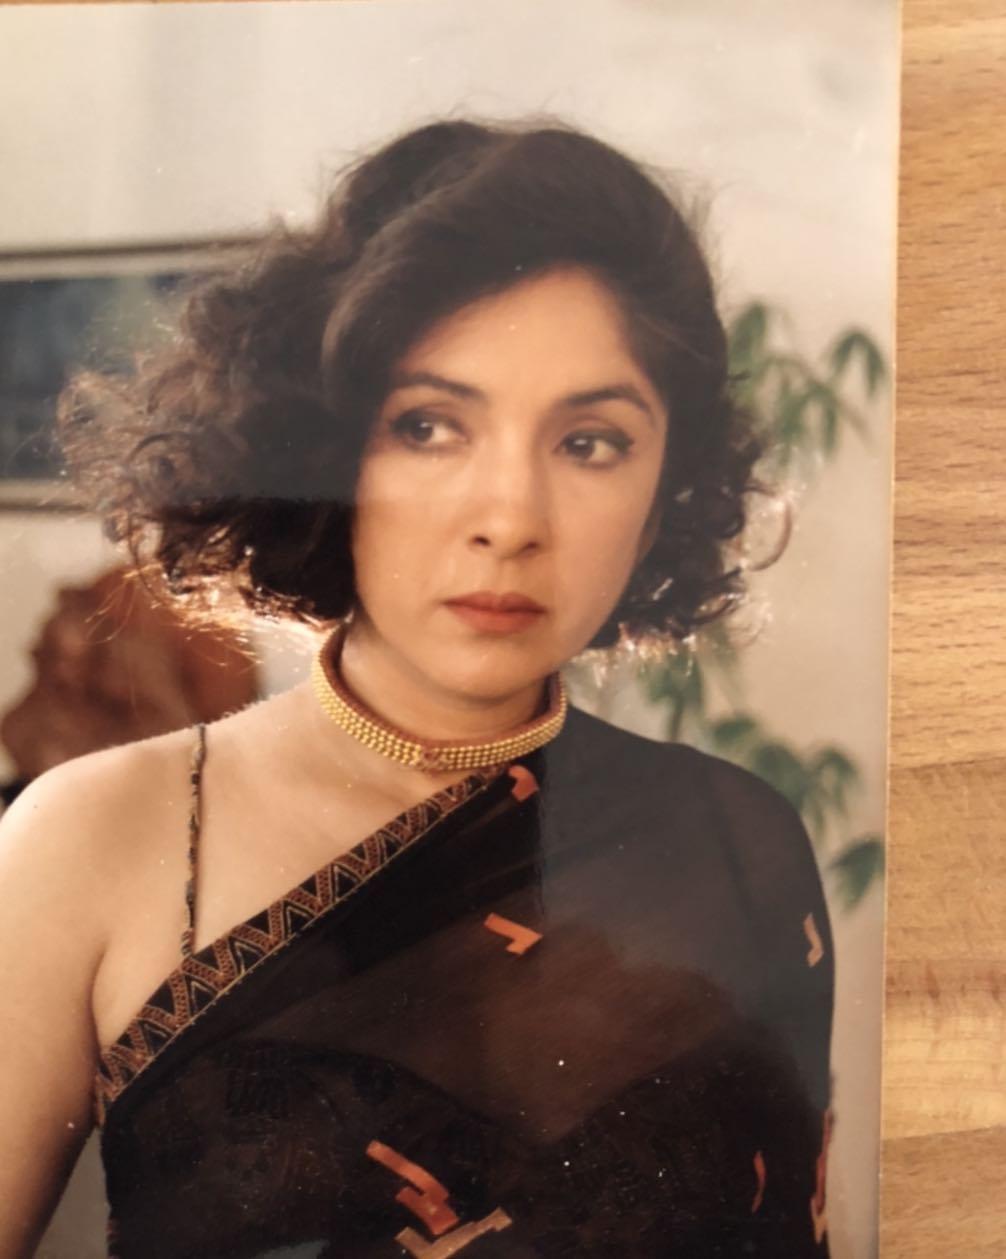 Neena Gupta wrote chapter on Choli Ke Peeche Kya Hai